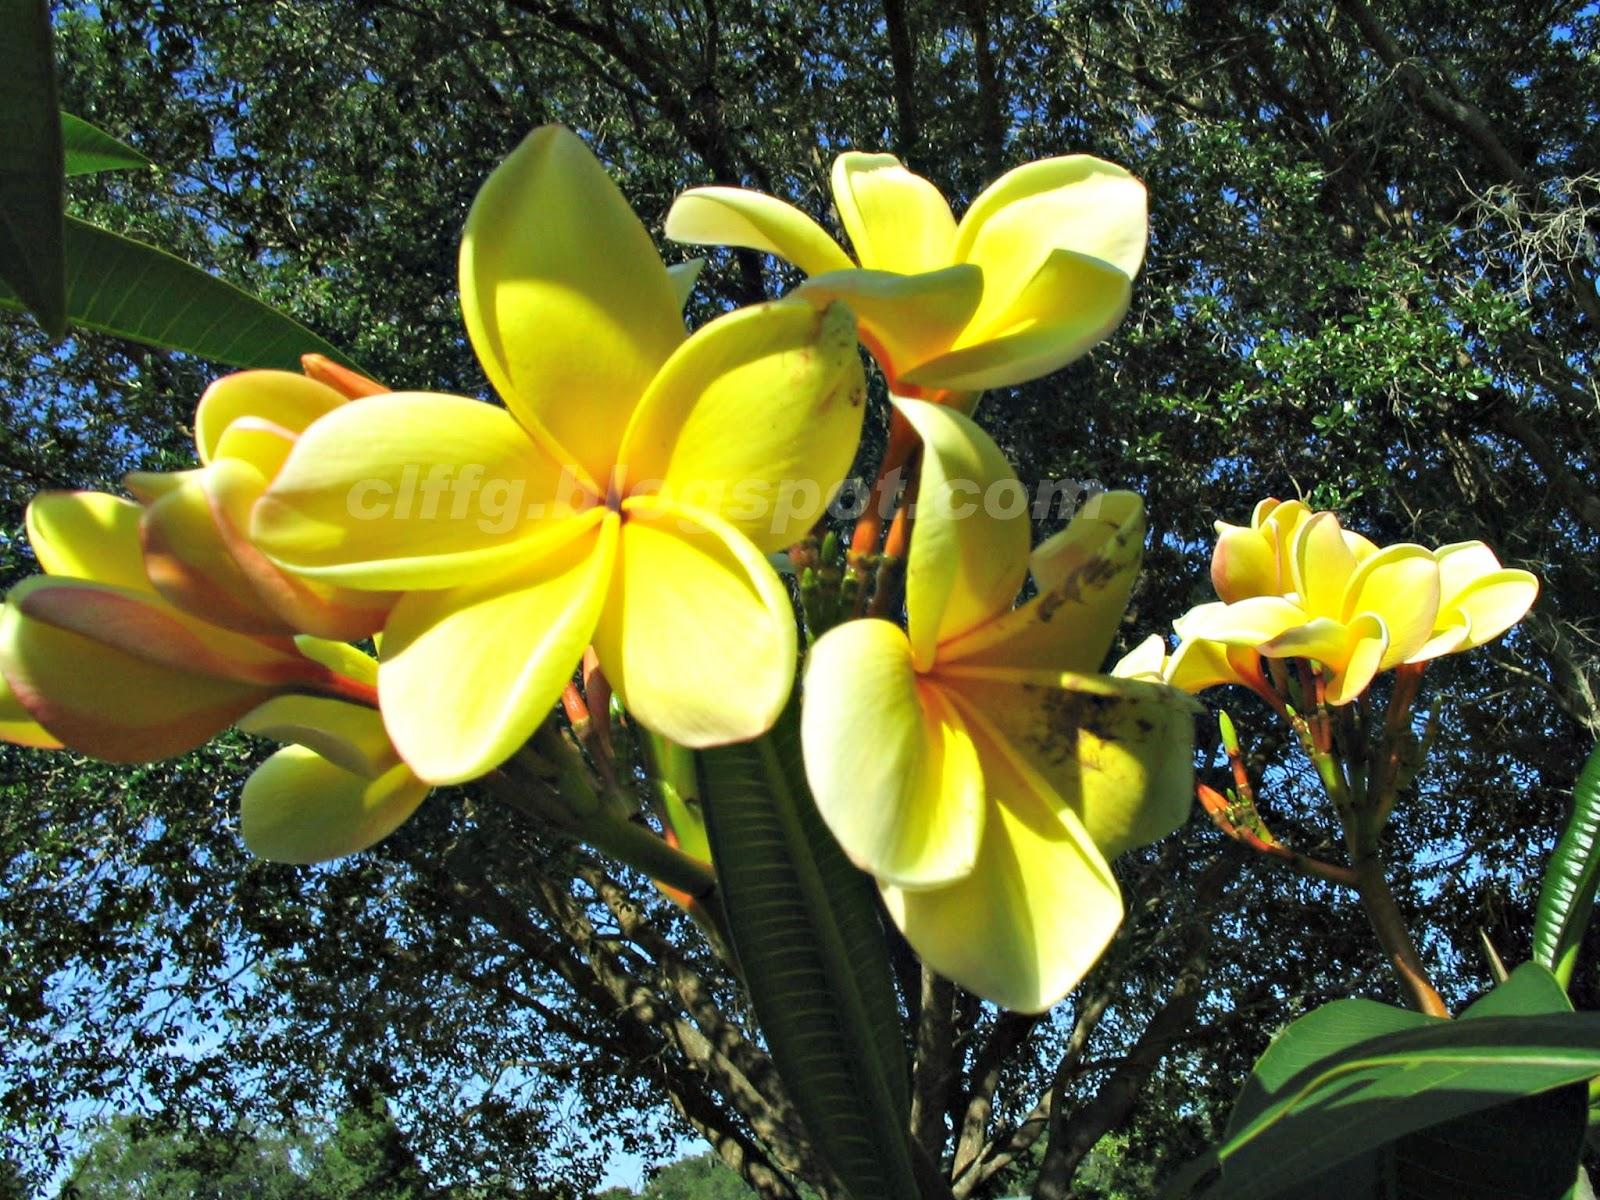 Hawaiian flower tree image collections flower wallpaper hd hawaiian flower tree images flower wallpaper hd hawaiian flower tree images flower wallpaper hd hawaiian flower izmirmasajfo